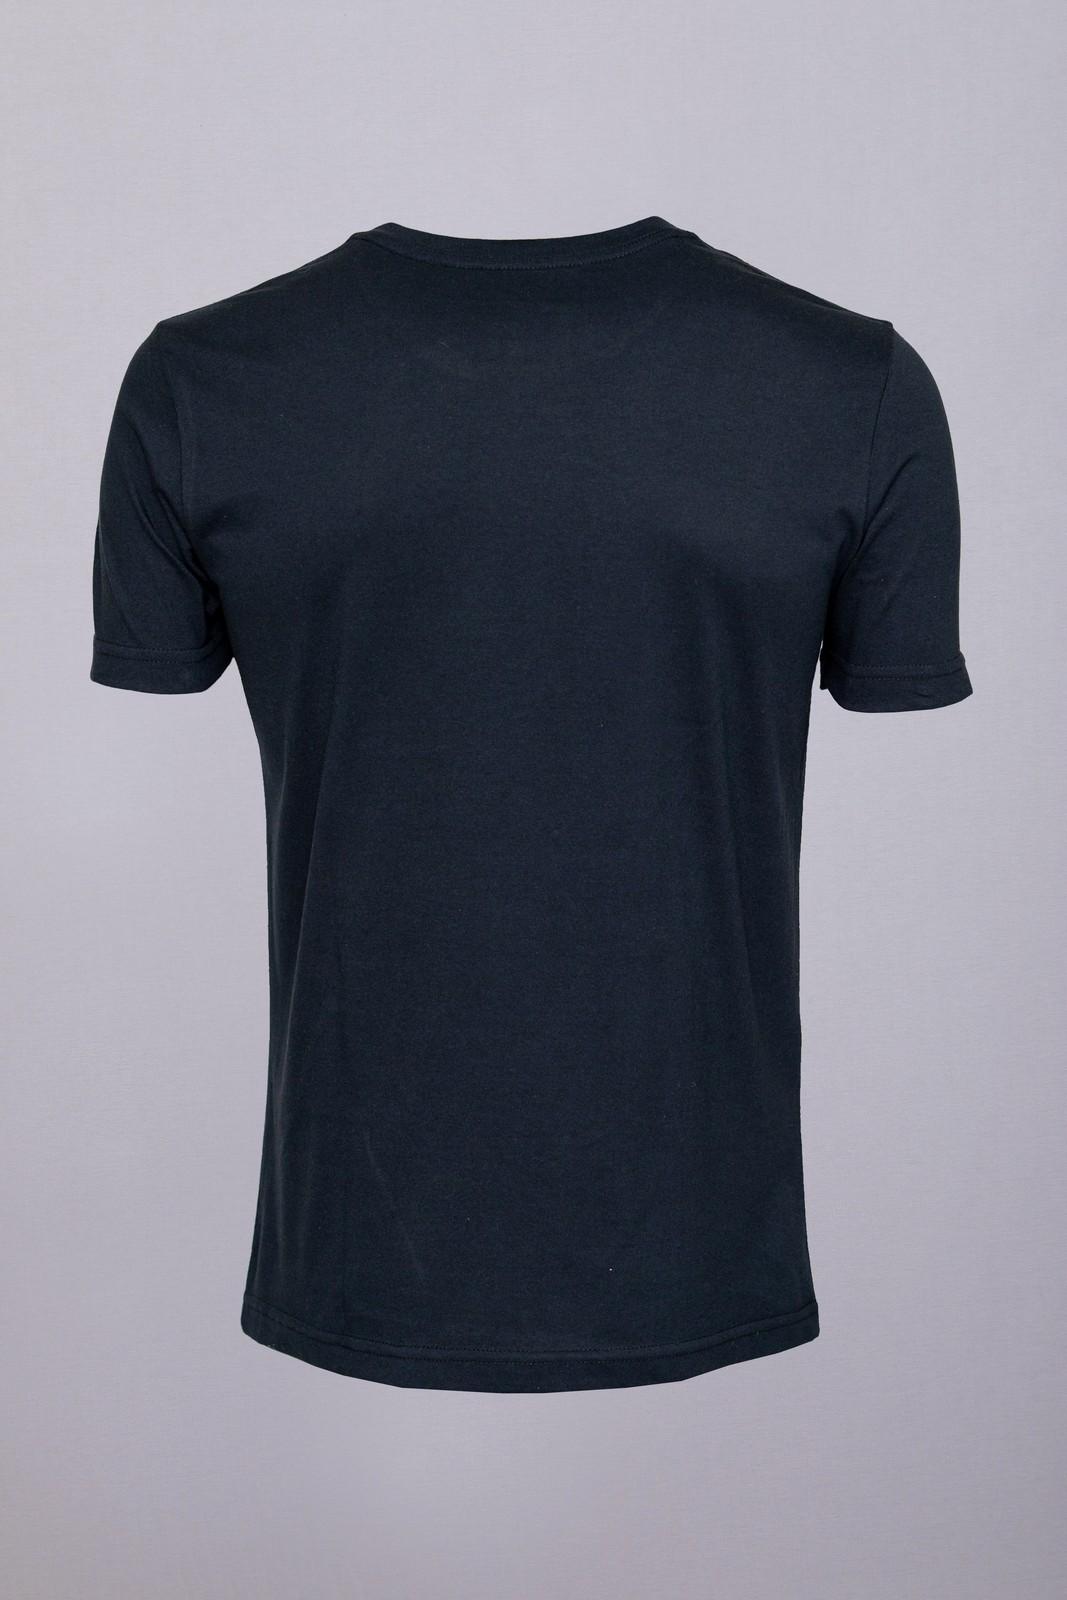 Camiseta CoolWave Looking For Waves Preta